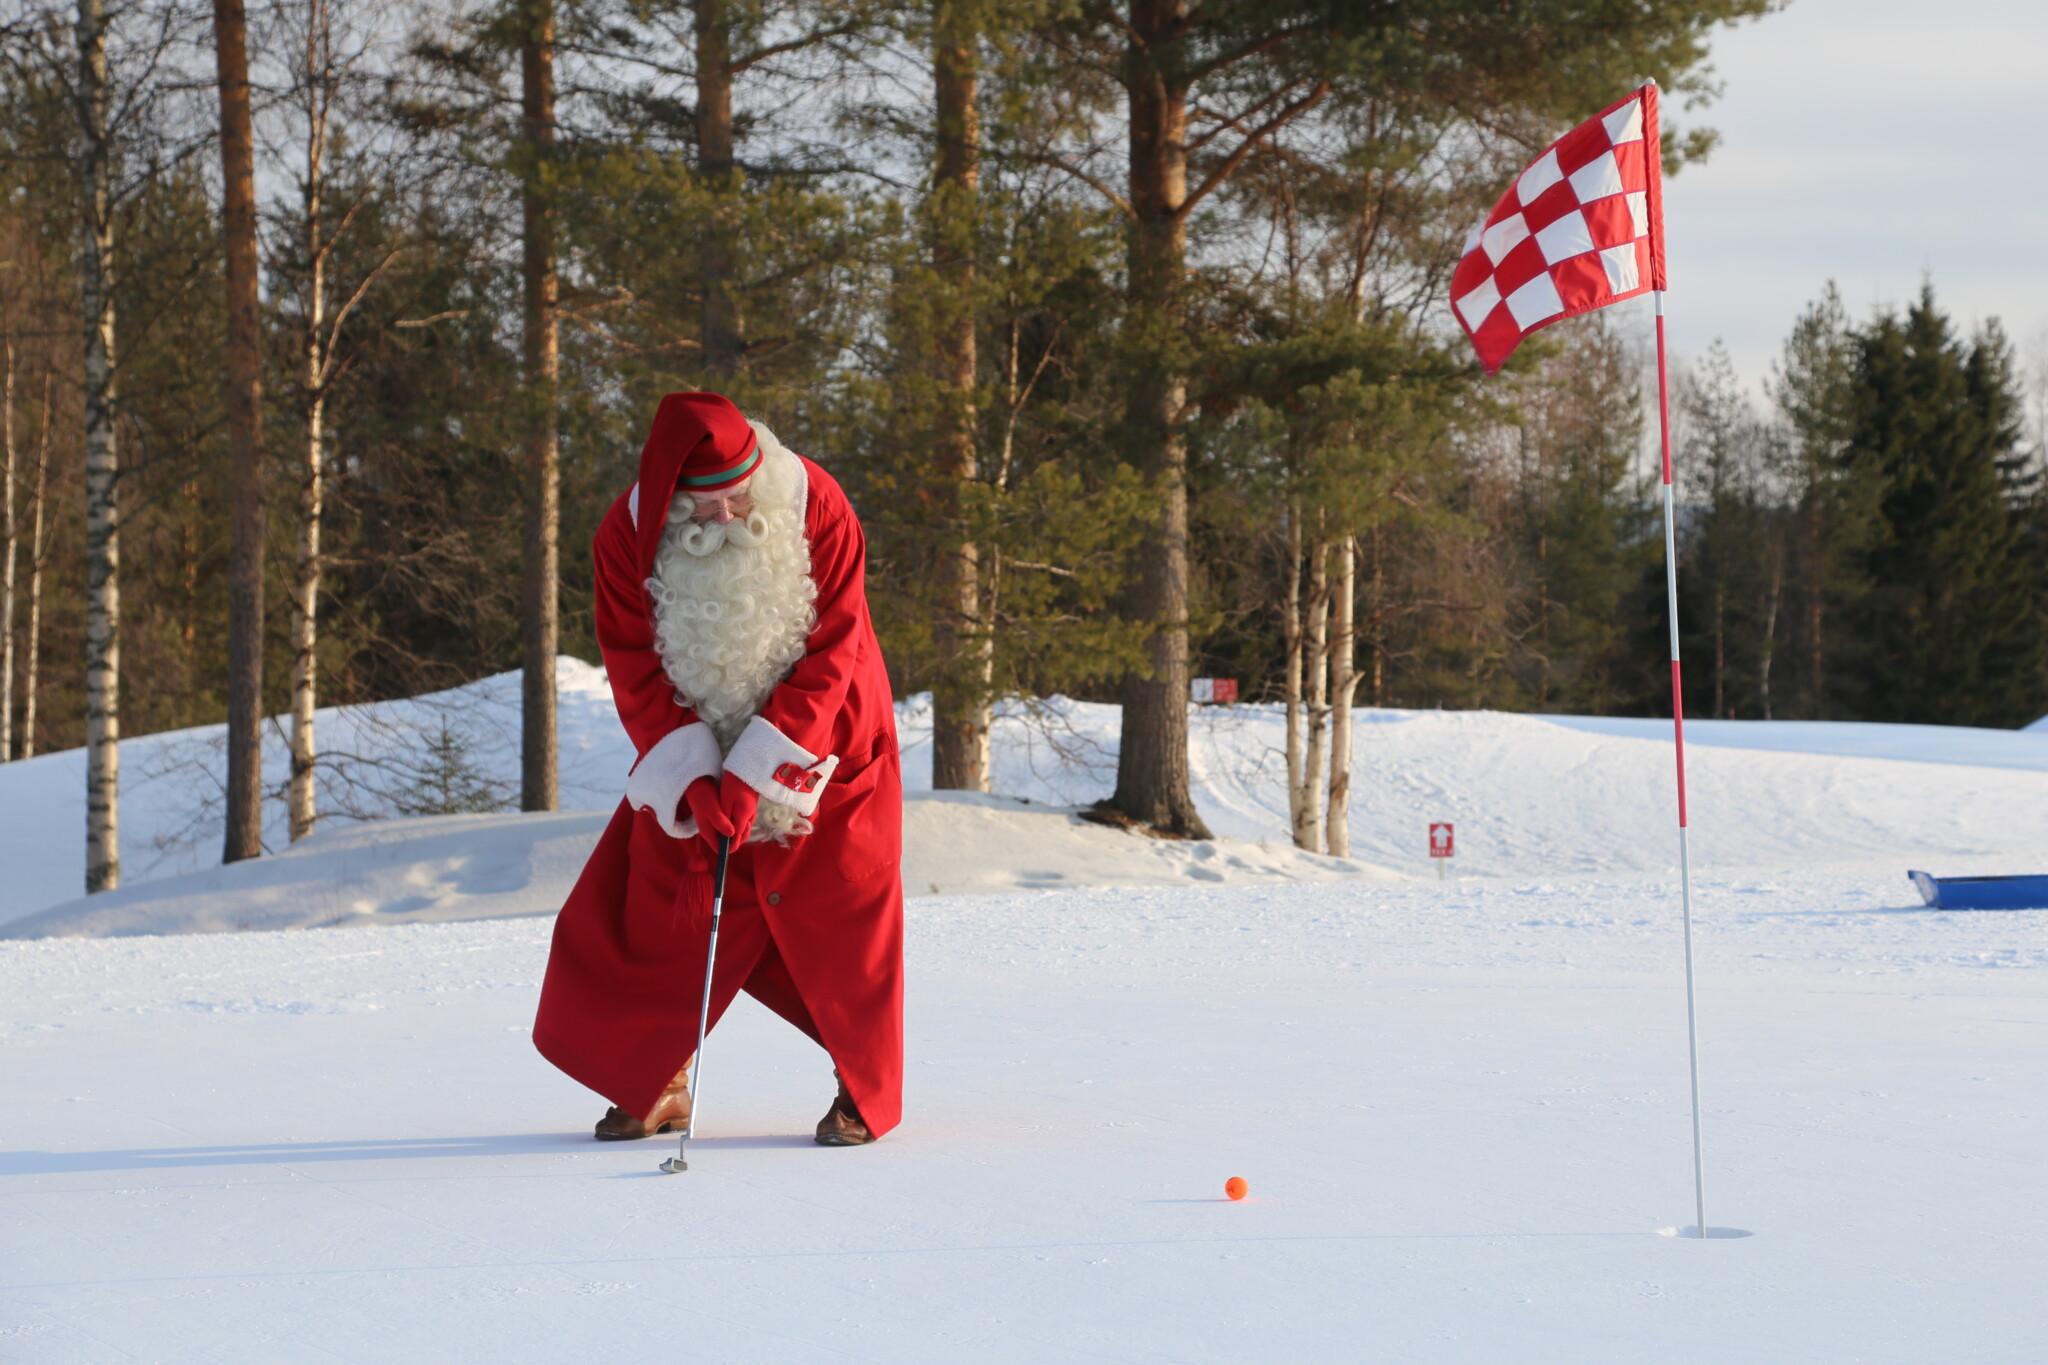 Santa Claus Golf Rovaniemi Lapland Finland